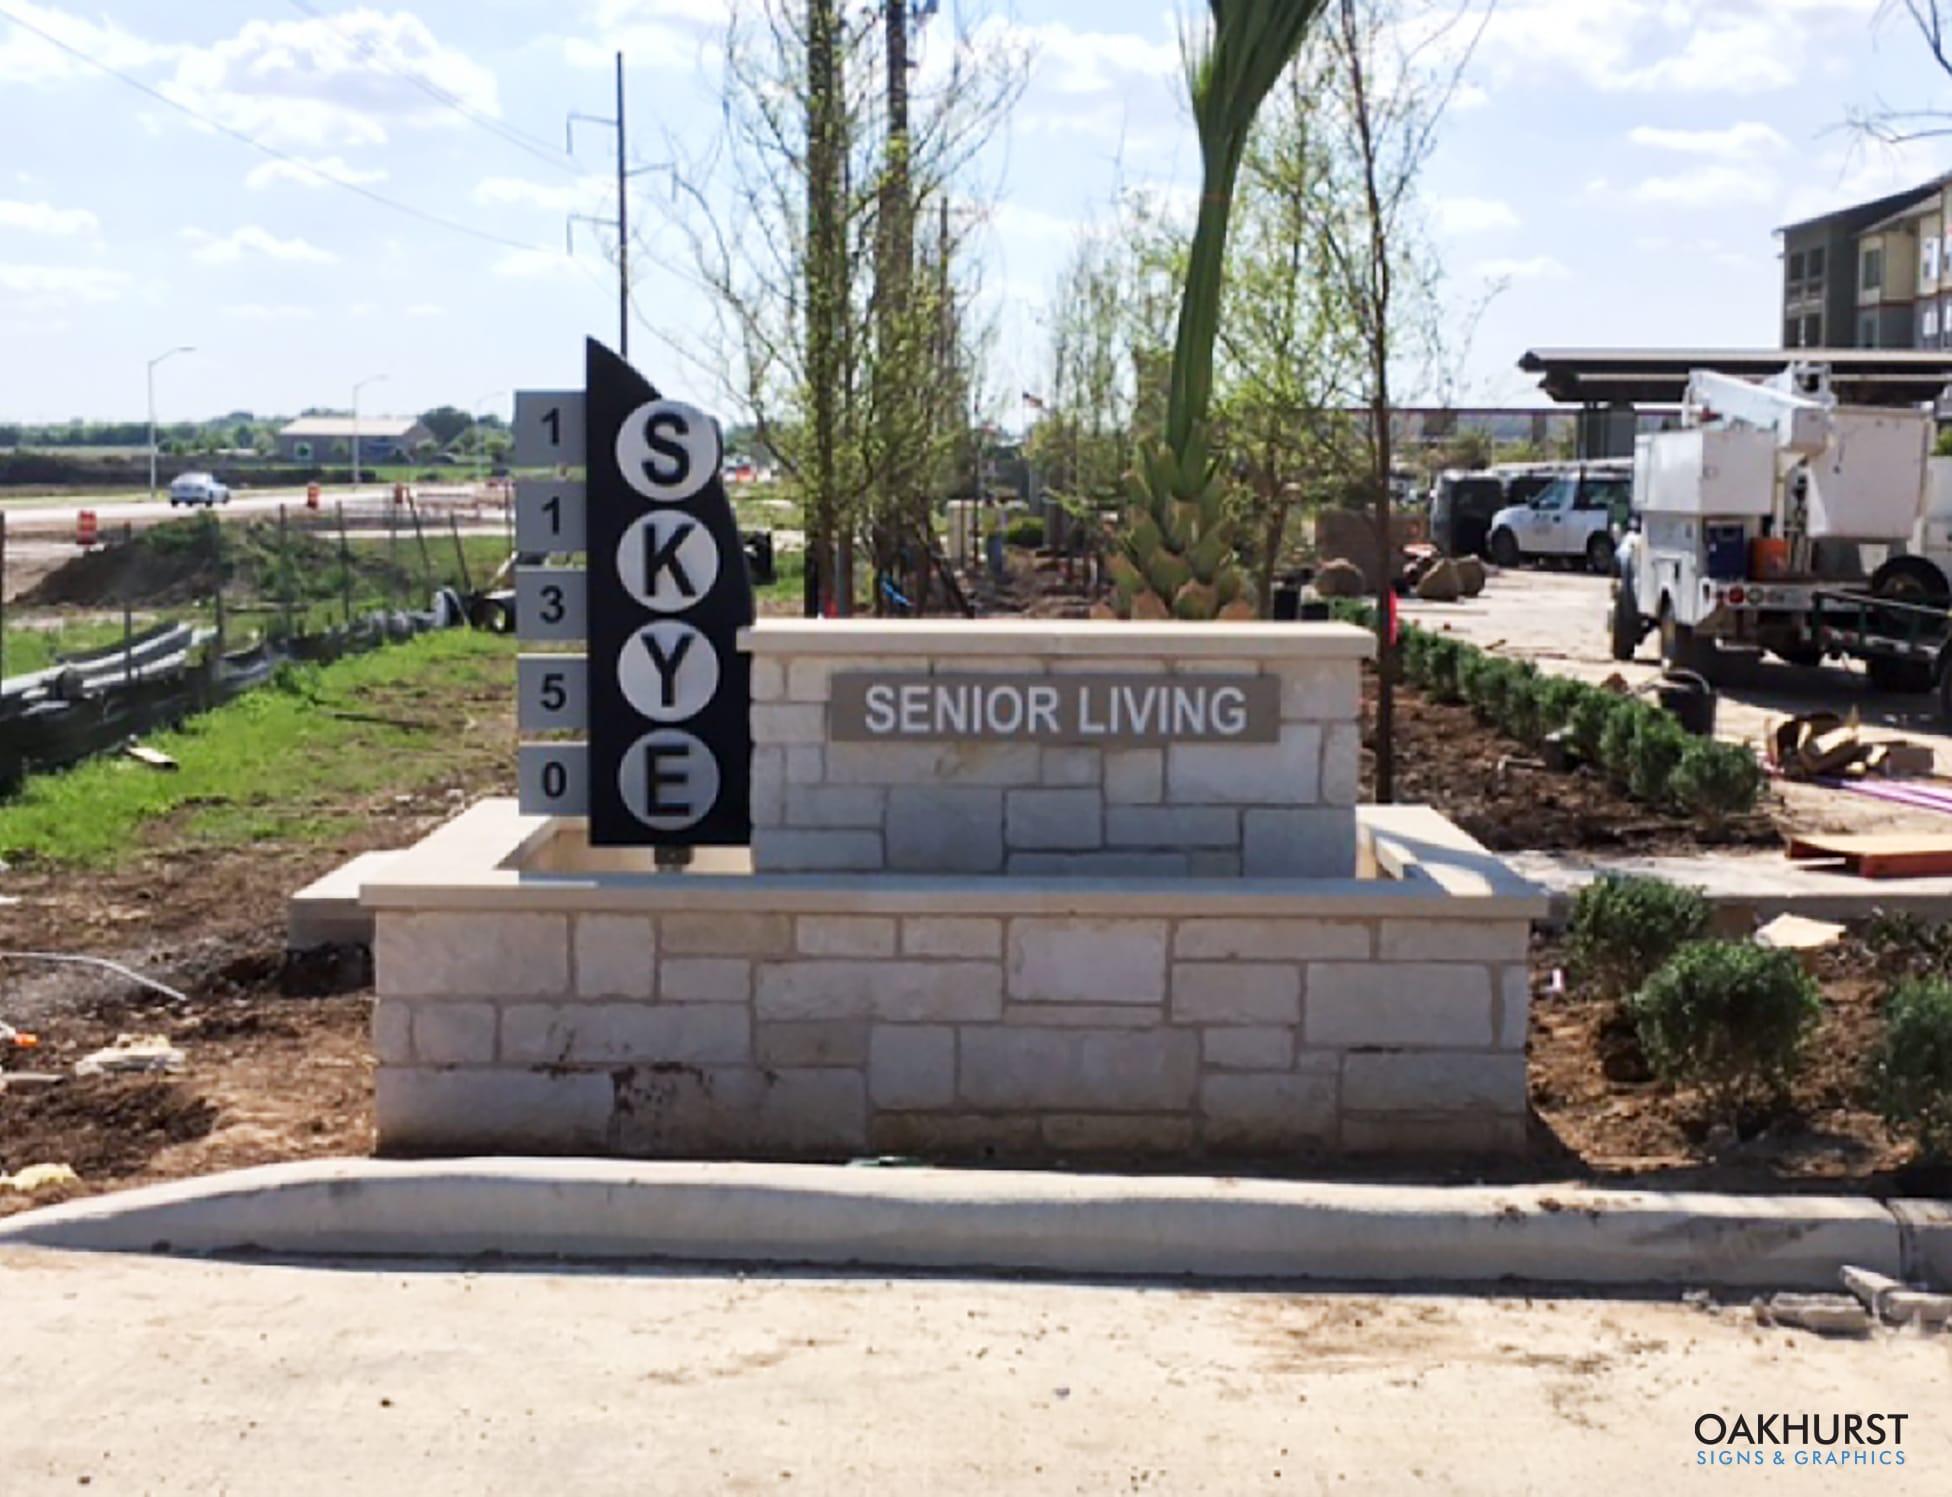 Senior living monument sign being installed